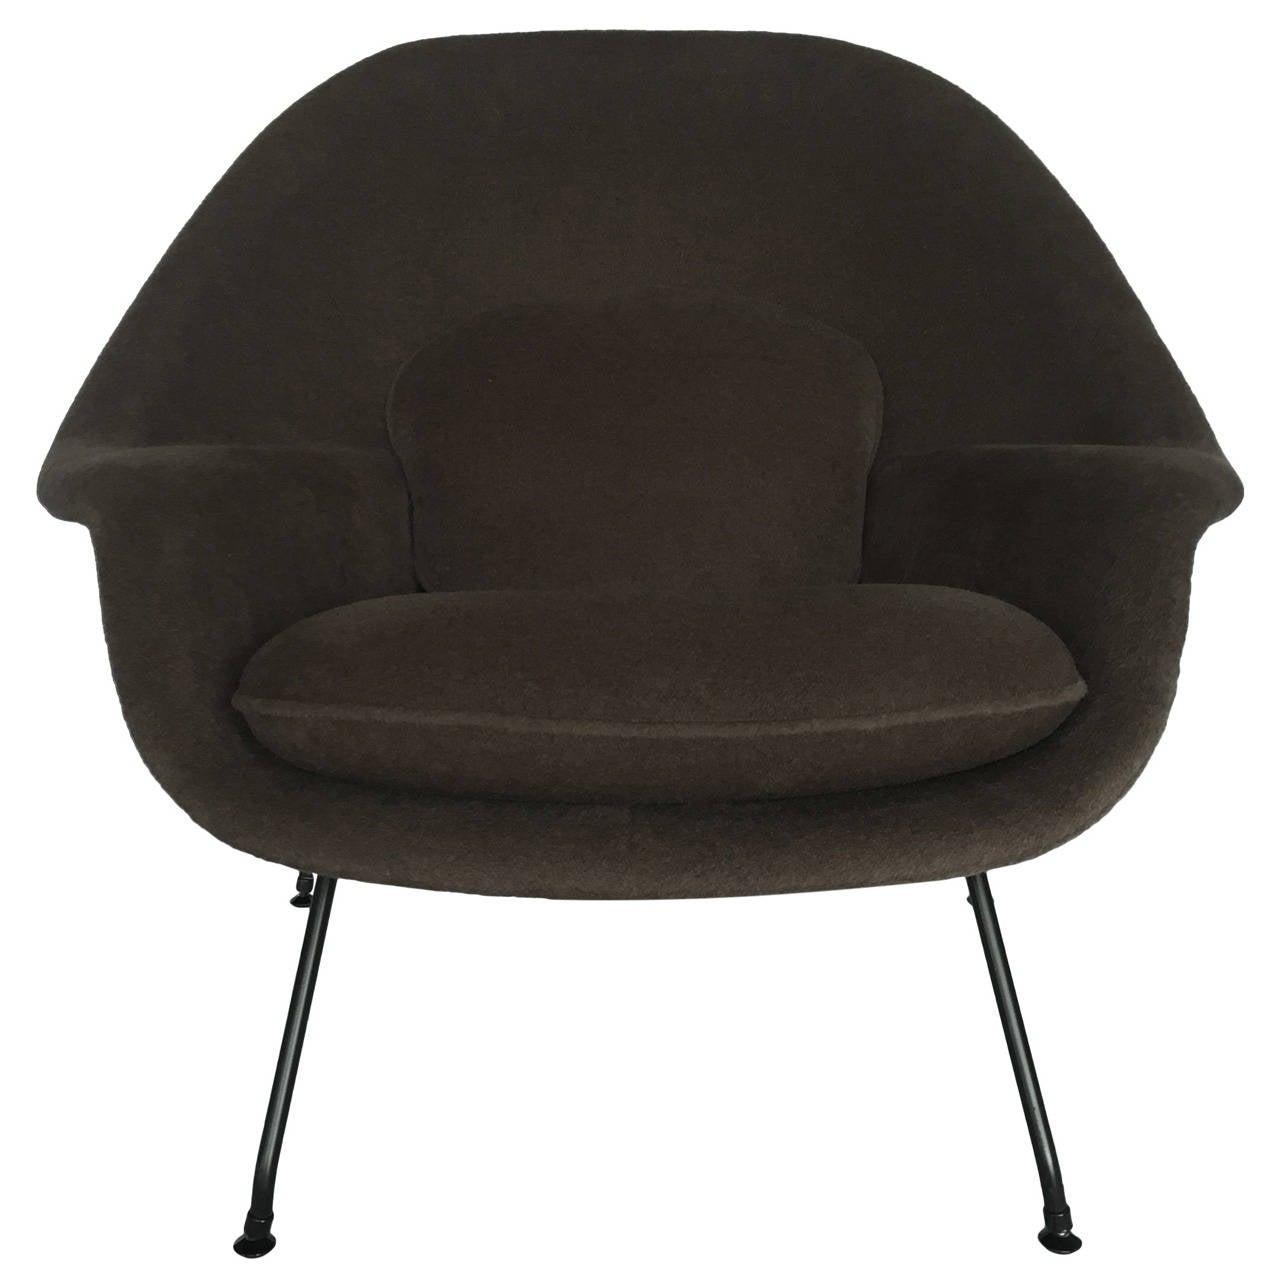 eero saarinen womb chair for knoll reupholstered in loro piana alpaca at 1stdibs. Black Bedroom Furniture Sets. Home Design Ideas